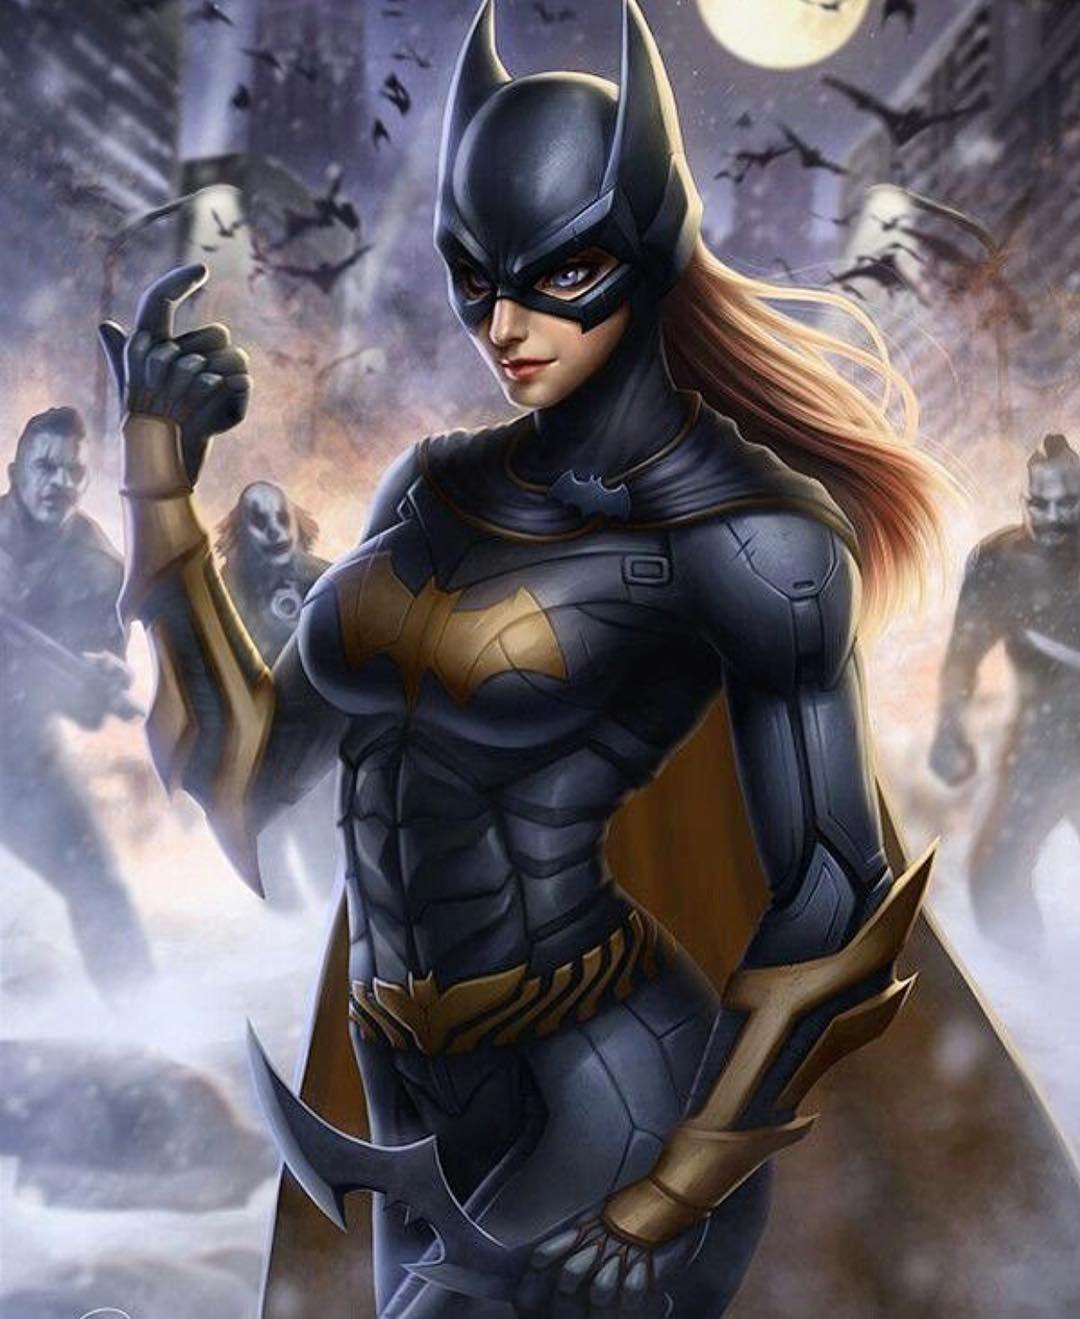 Barbara Gordon Aka Batgirl Dc Gotham Dccomics Batman Batgirl Dc Comics Dc Comics A